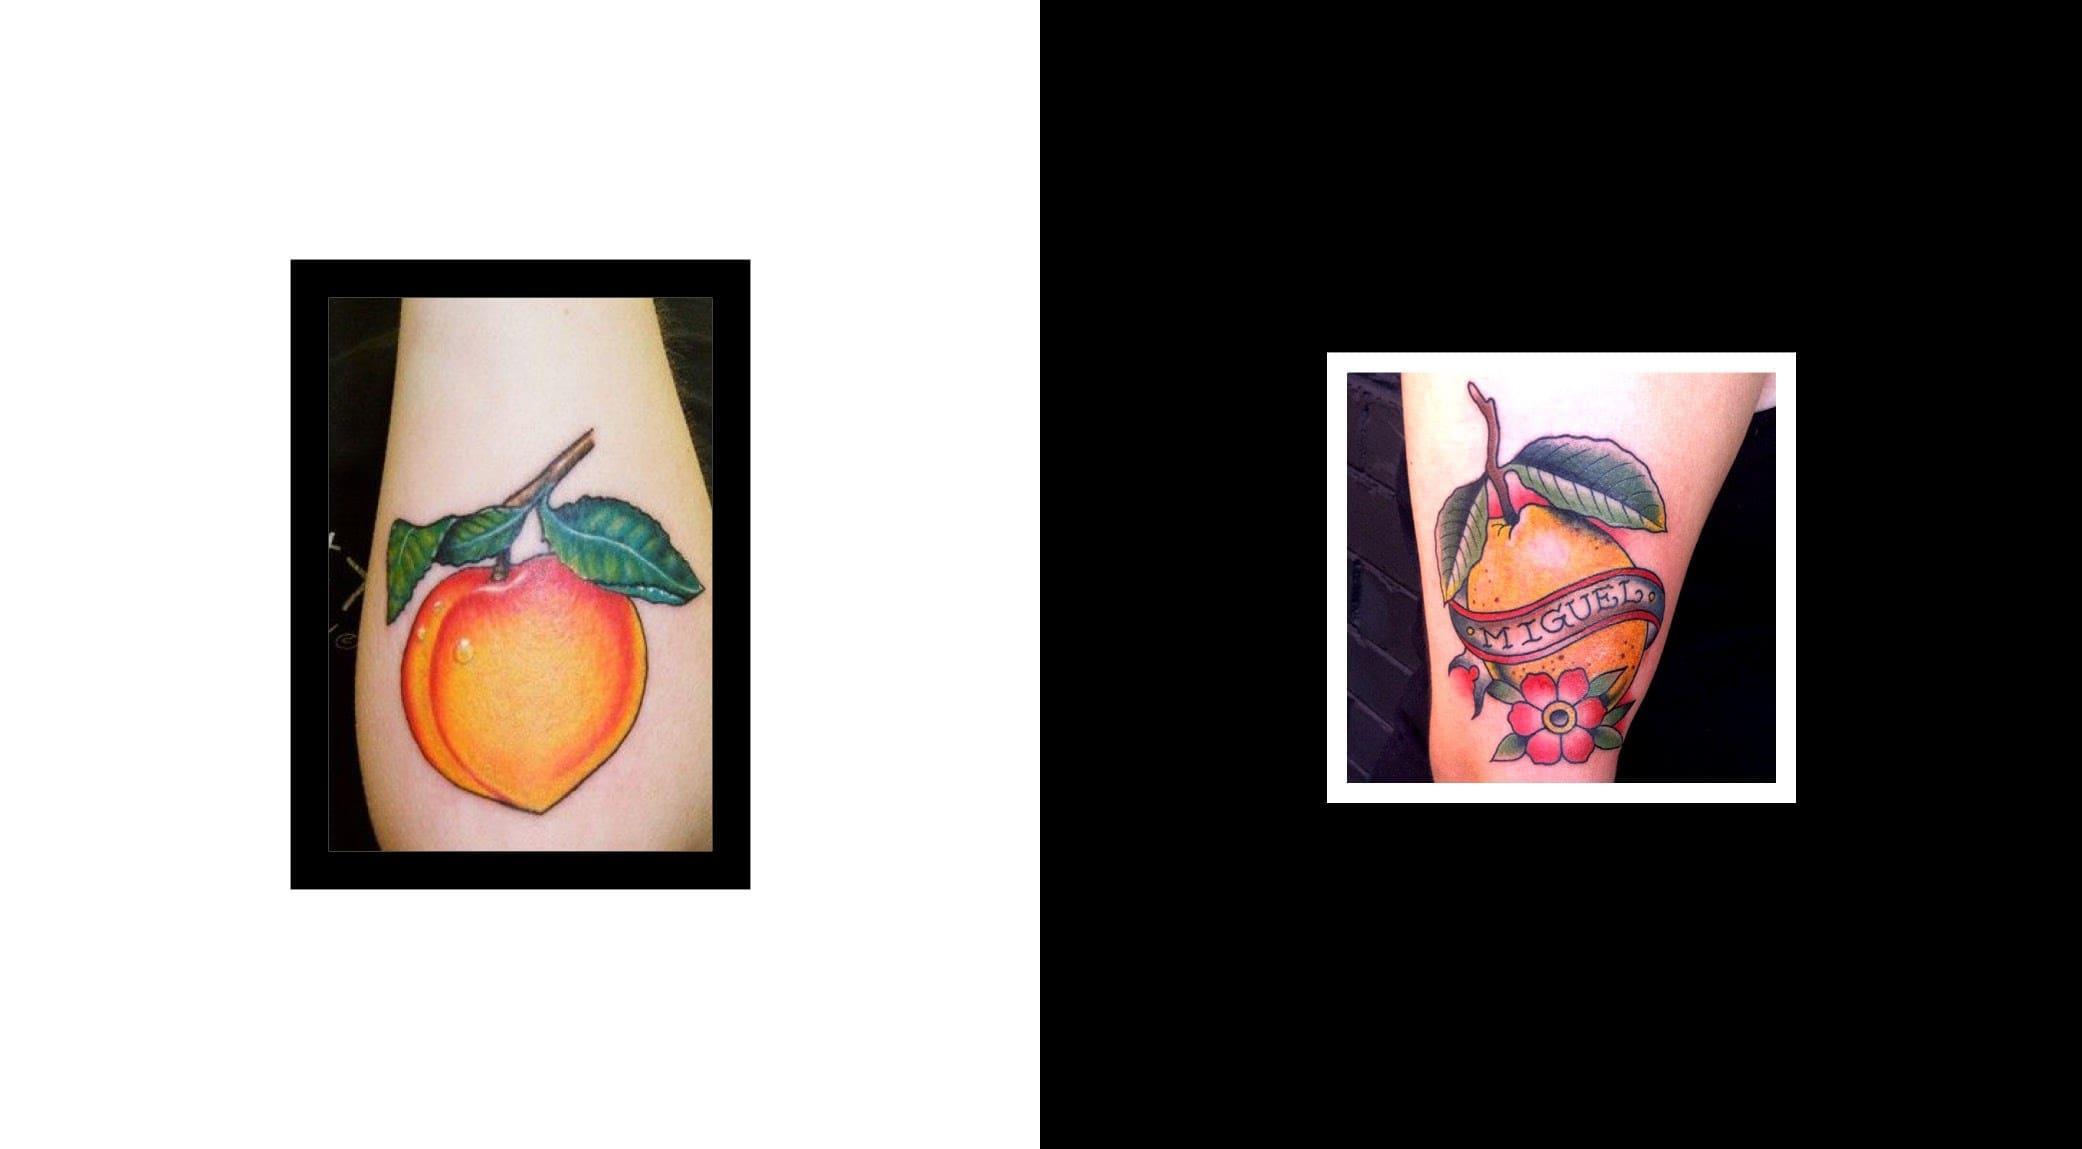 original_005-tattoo-finedininglovers5.jpg